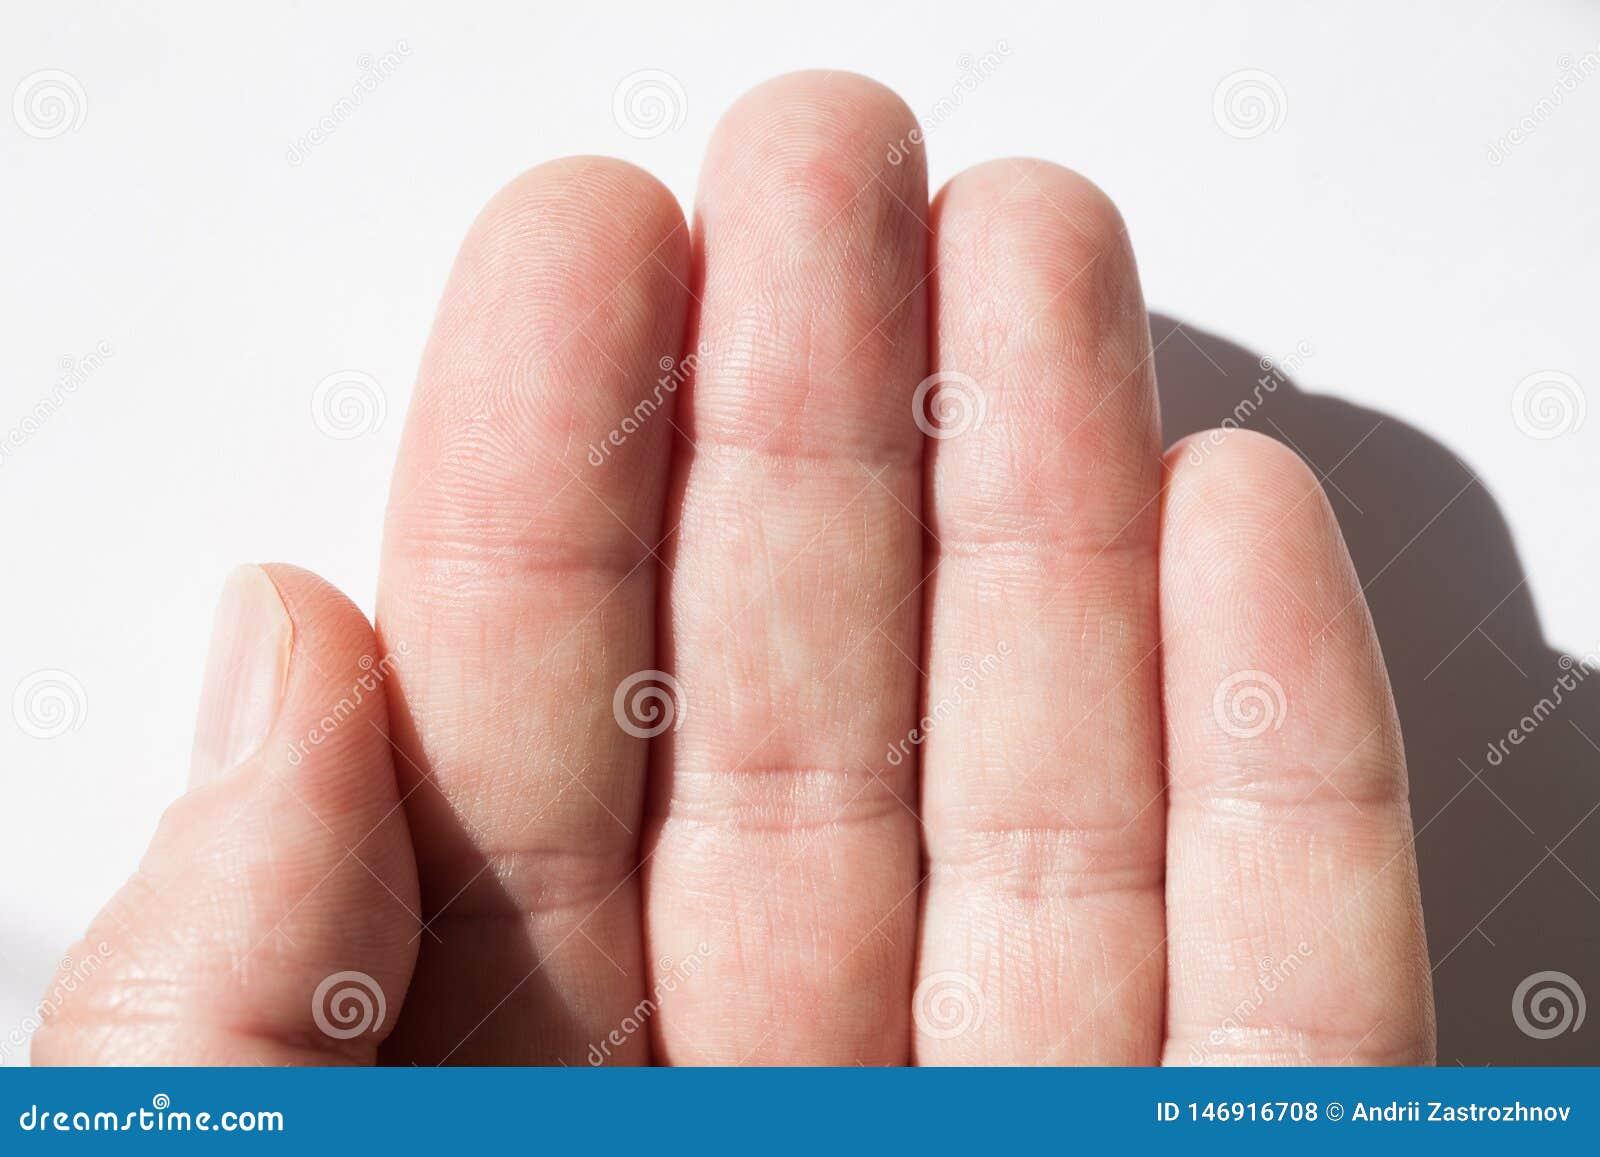 Finger skin texture, fingerprint close-up